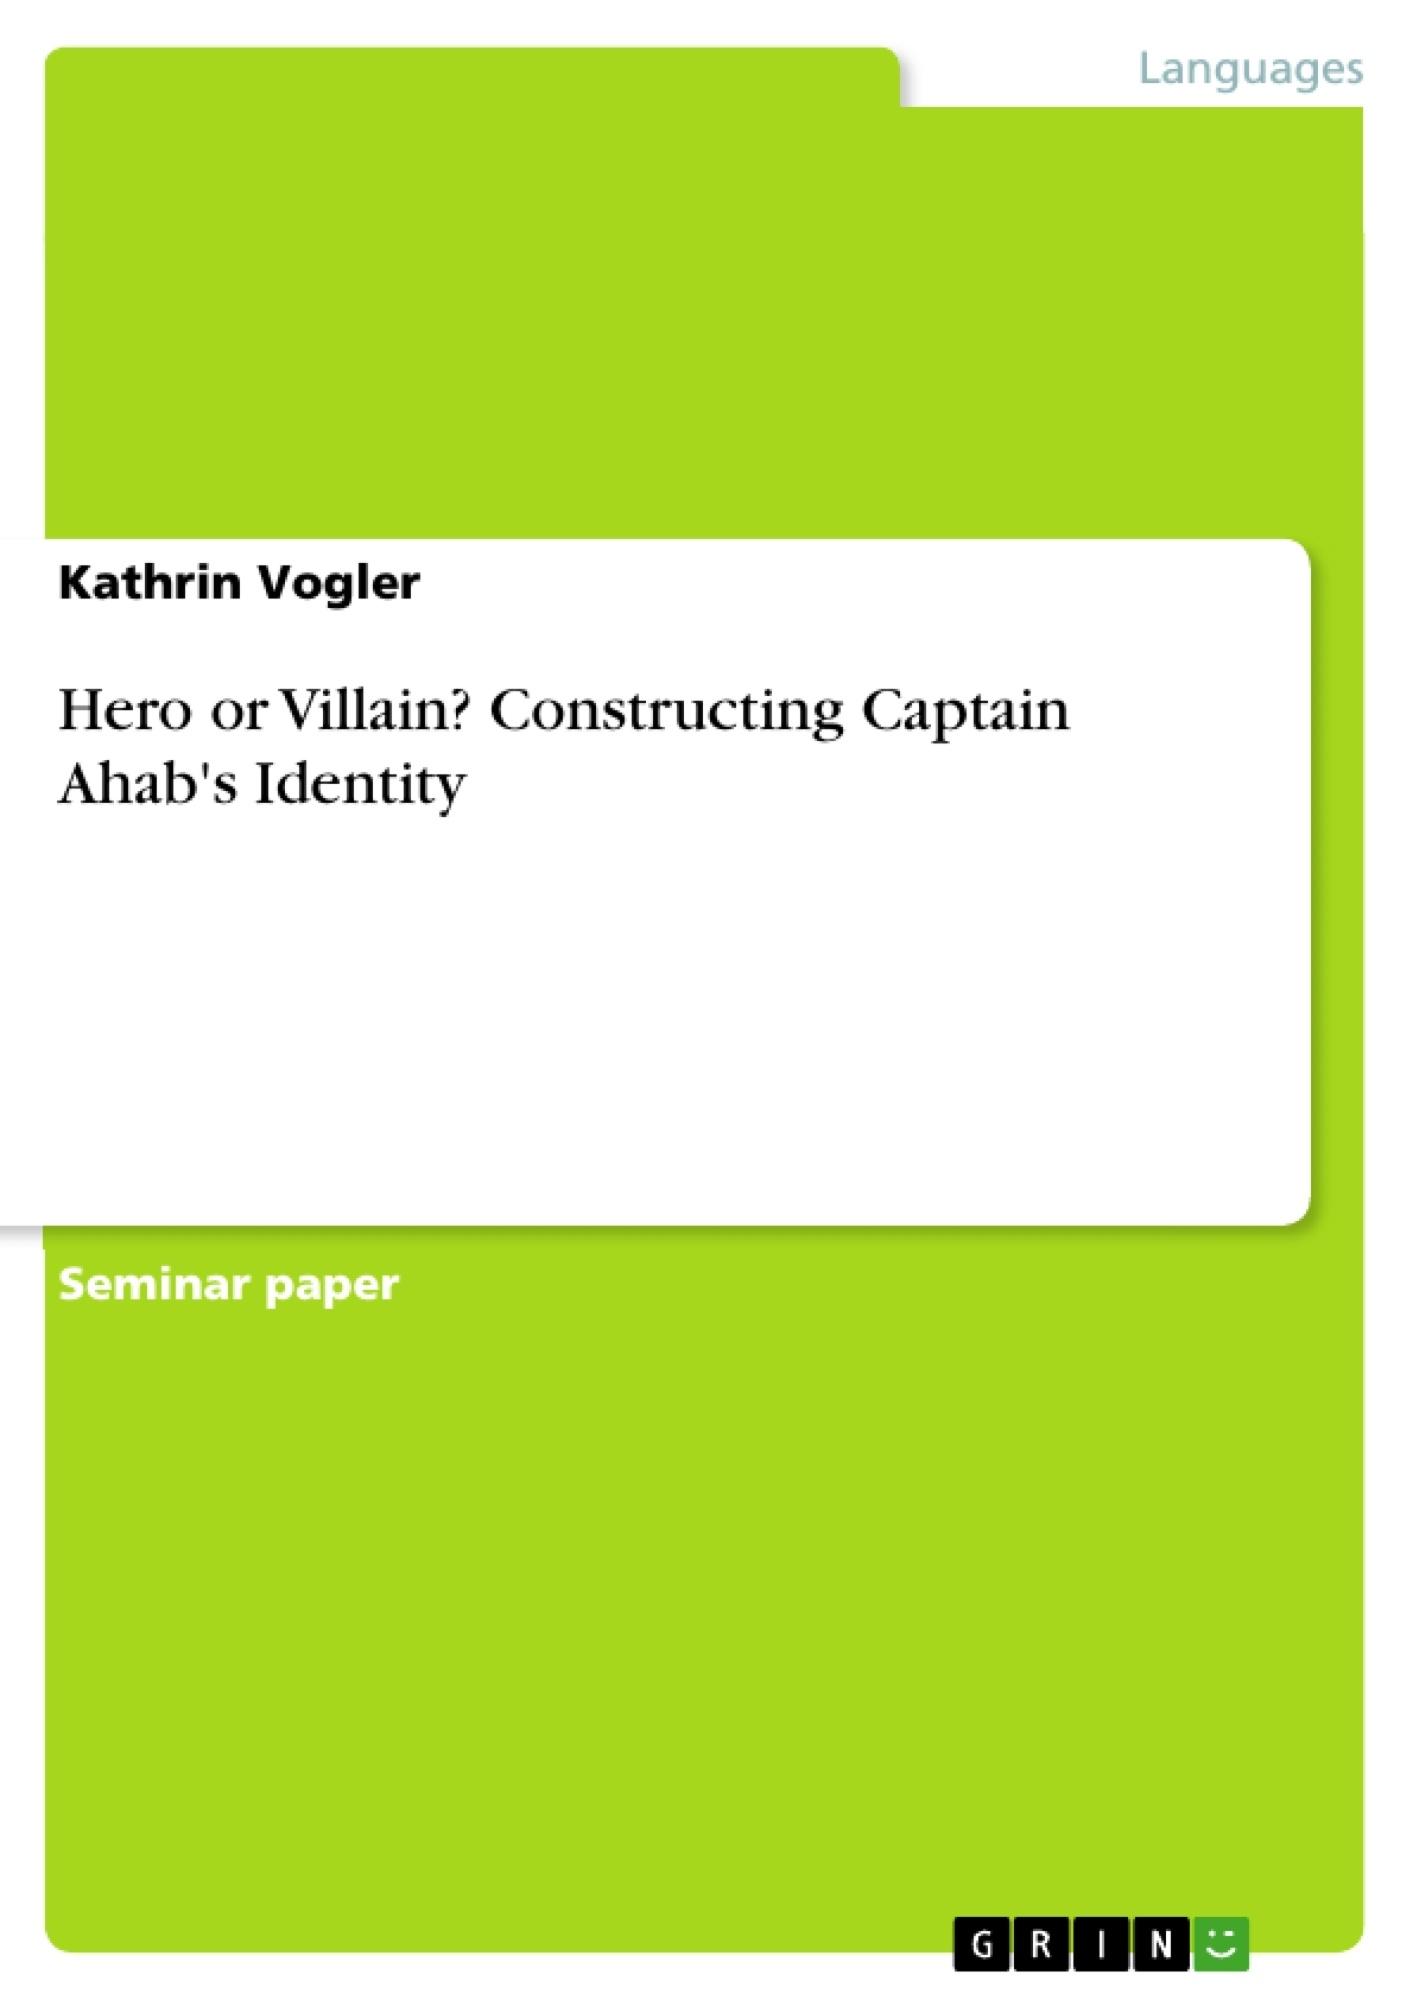 Title: Hero or Villain? Constructing Captain Ahab's Identity